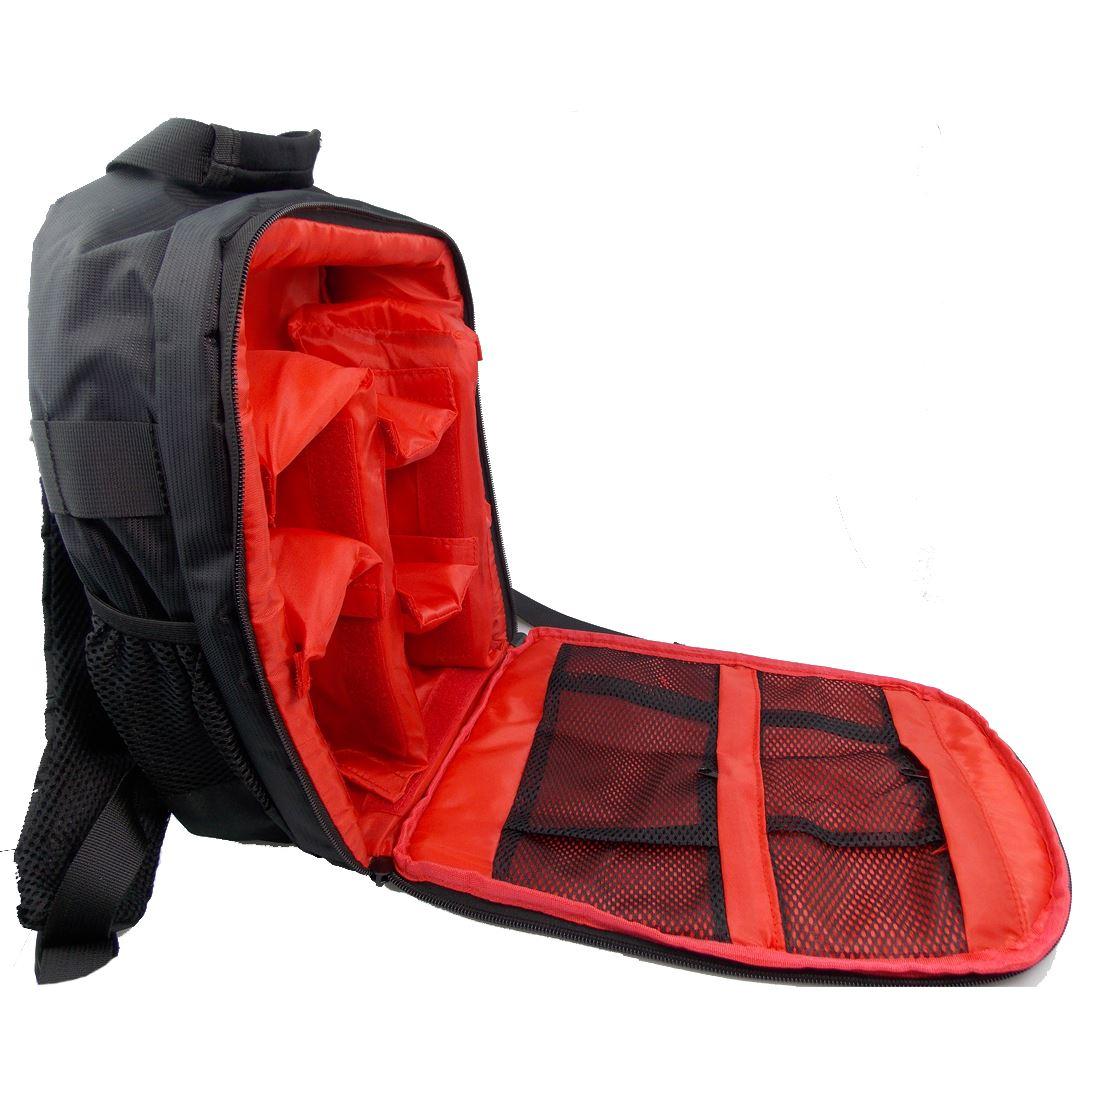 Camera-Bag-DSLR-SLR-Laptop-Backpack-Rucksack-Case-For-Nikon-Sony-Canon-Olympus